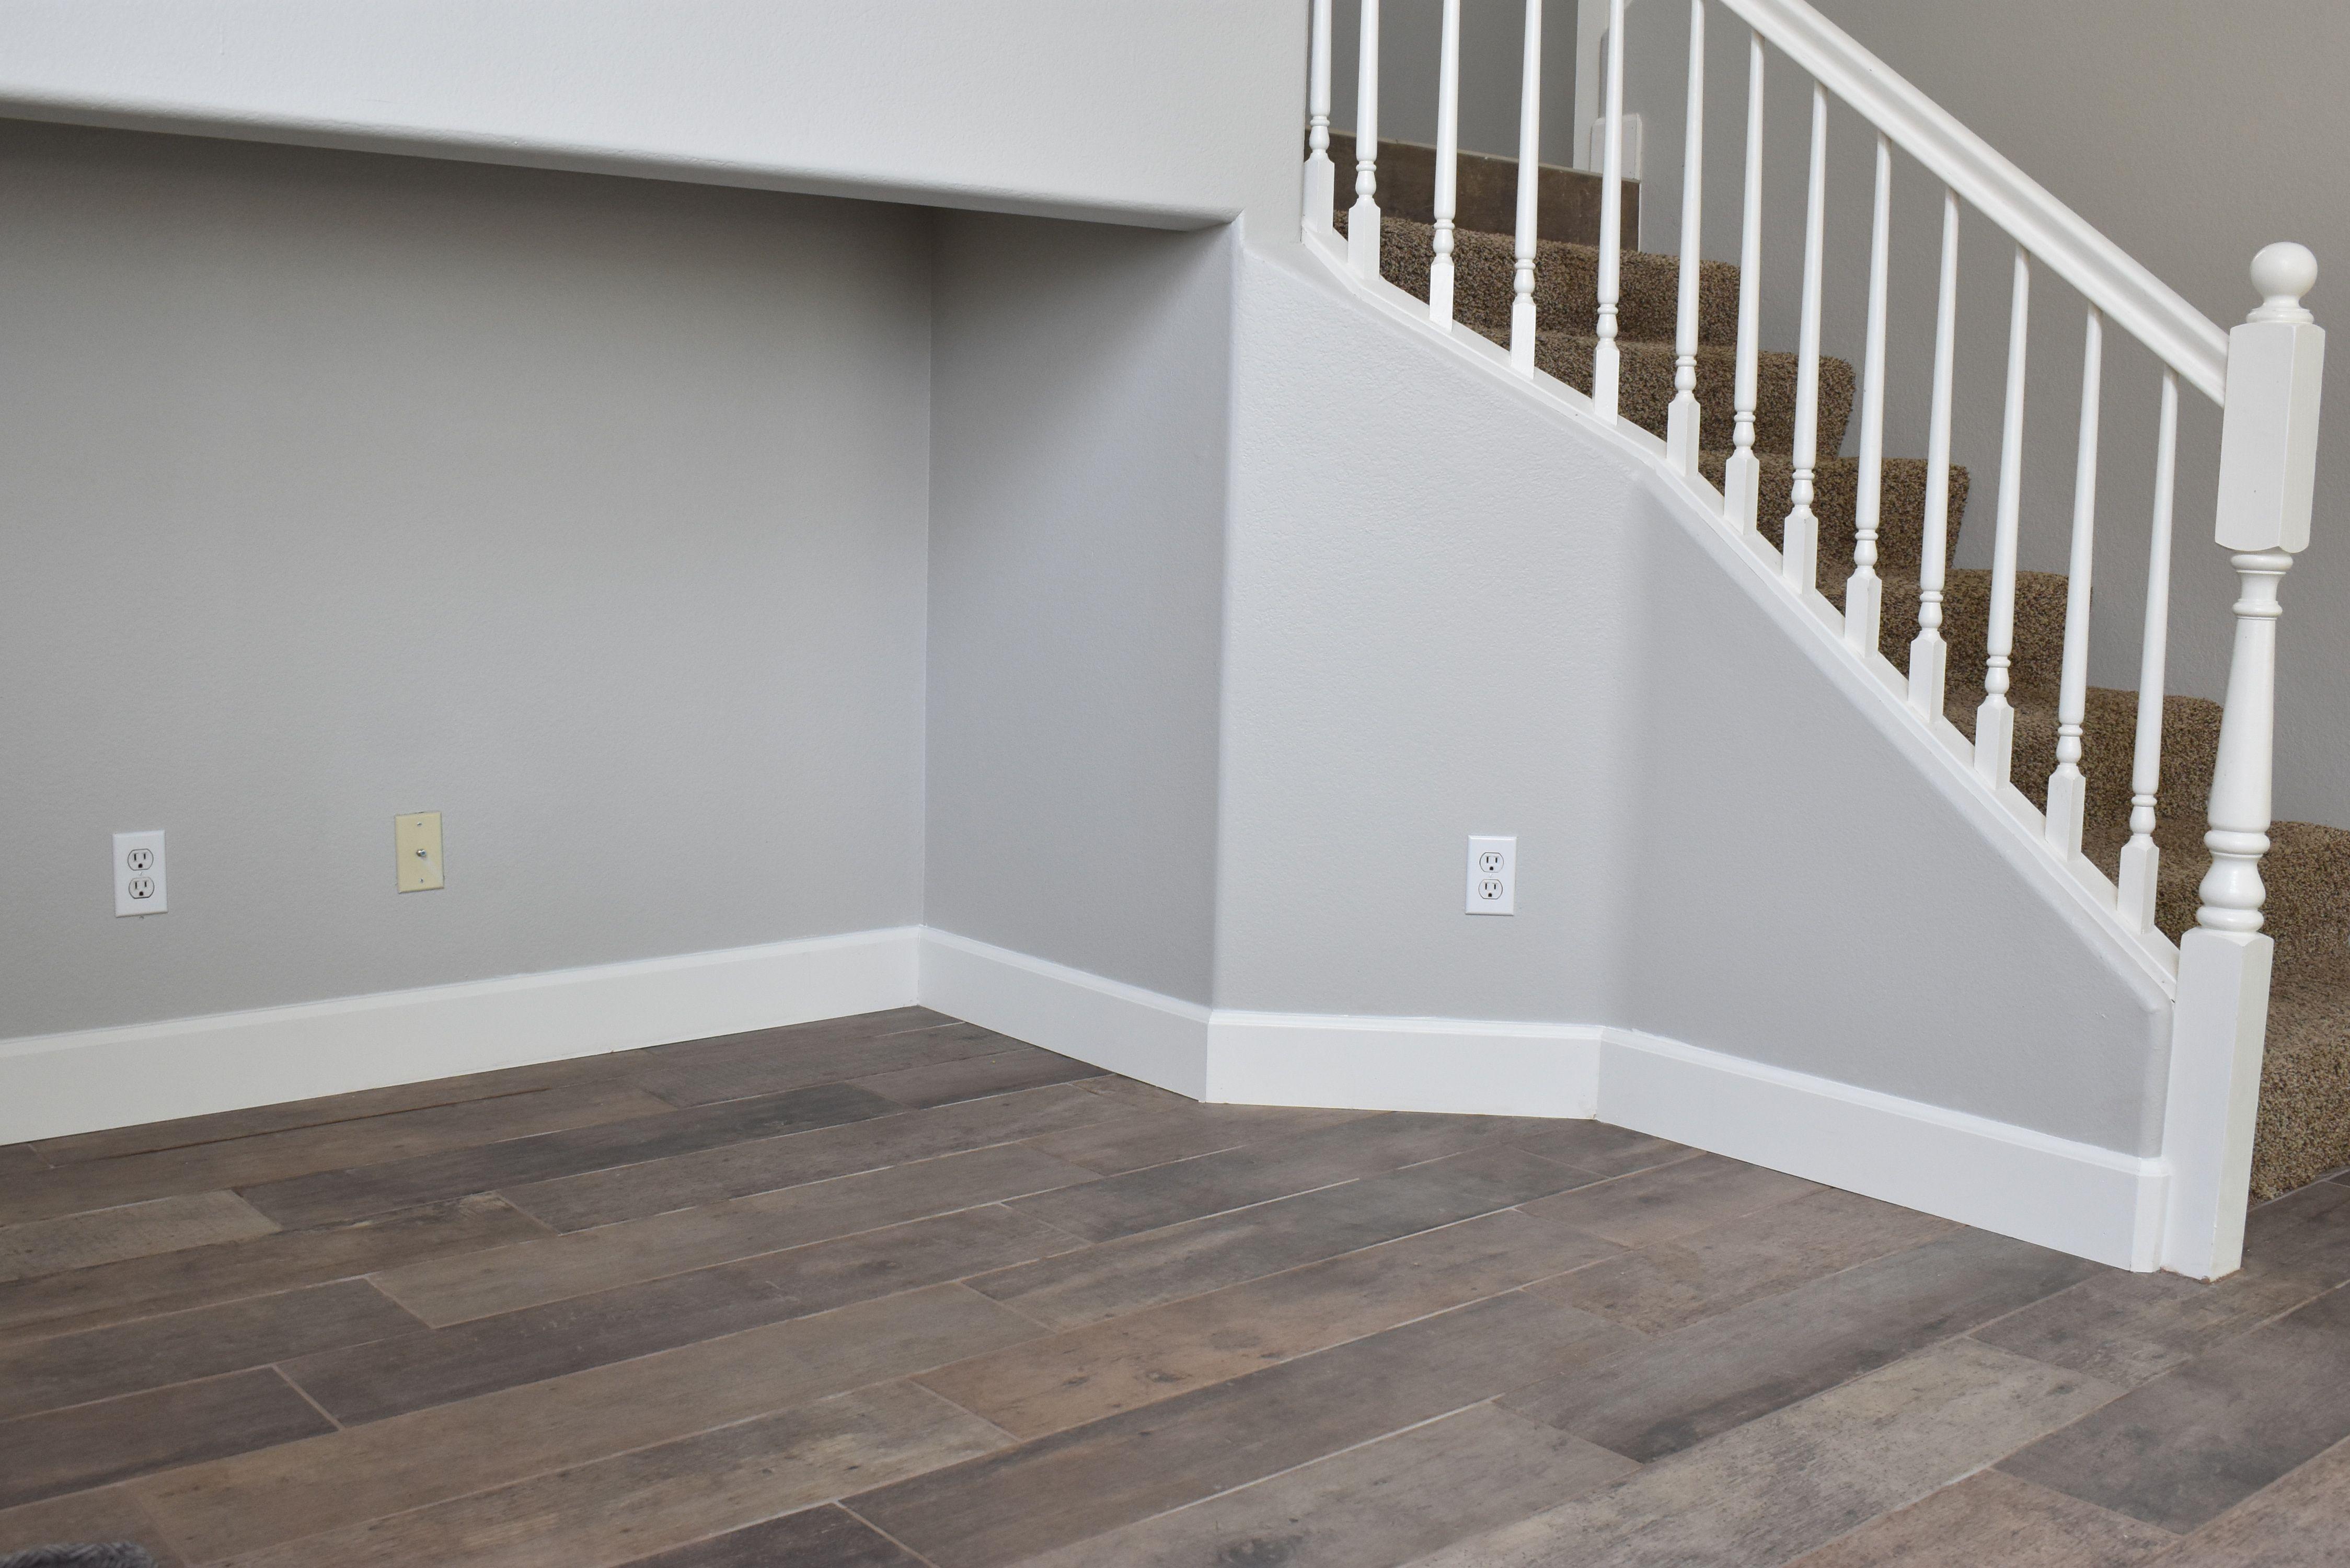 Repose gray paint, tall baseboards & porcelain tile floors